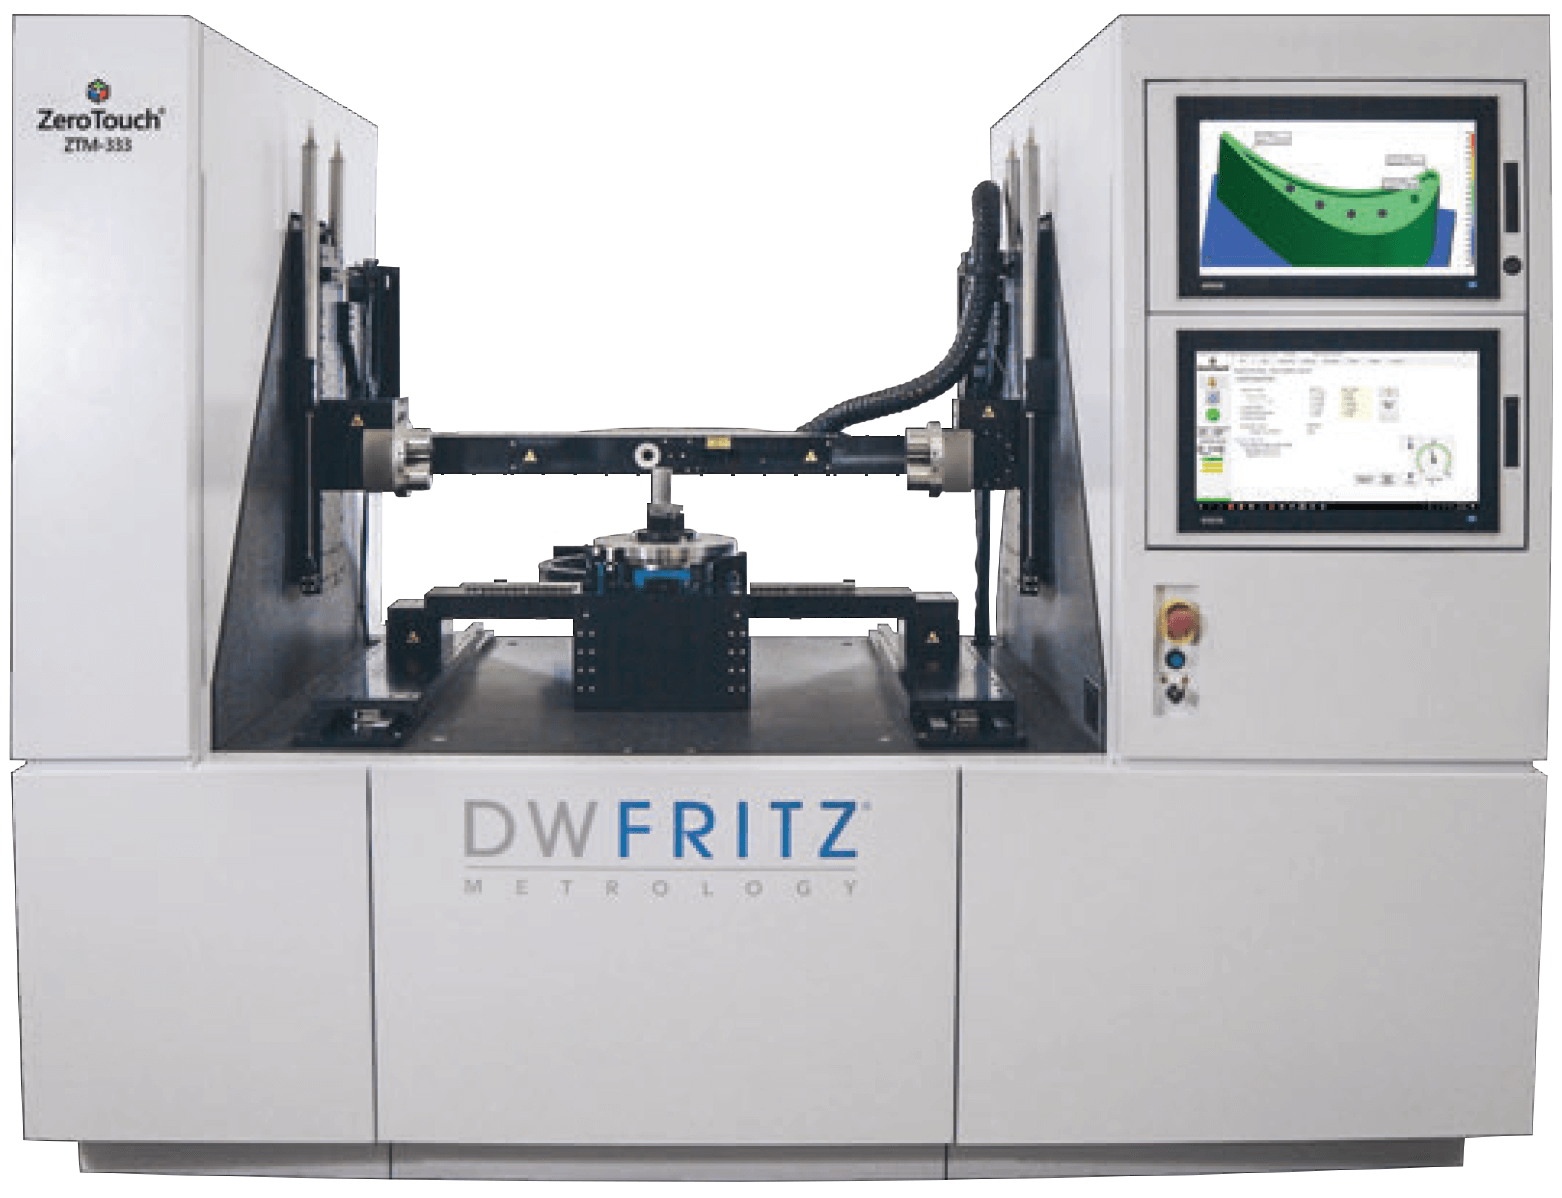 DWFritz Zerotouch ZTM-333